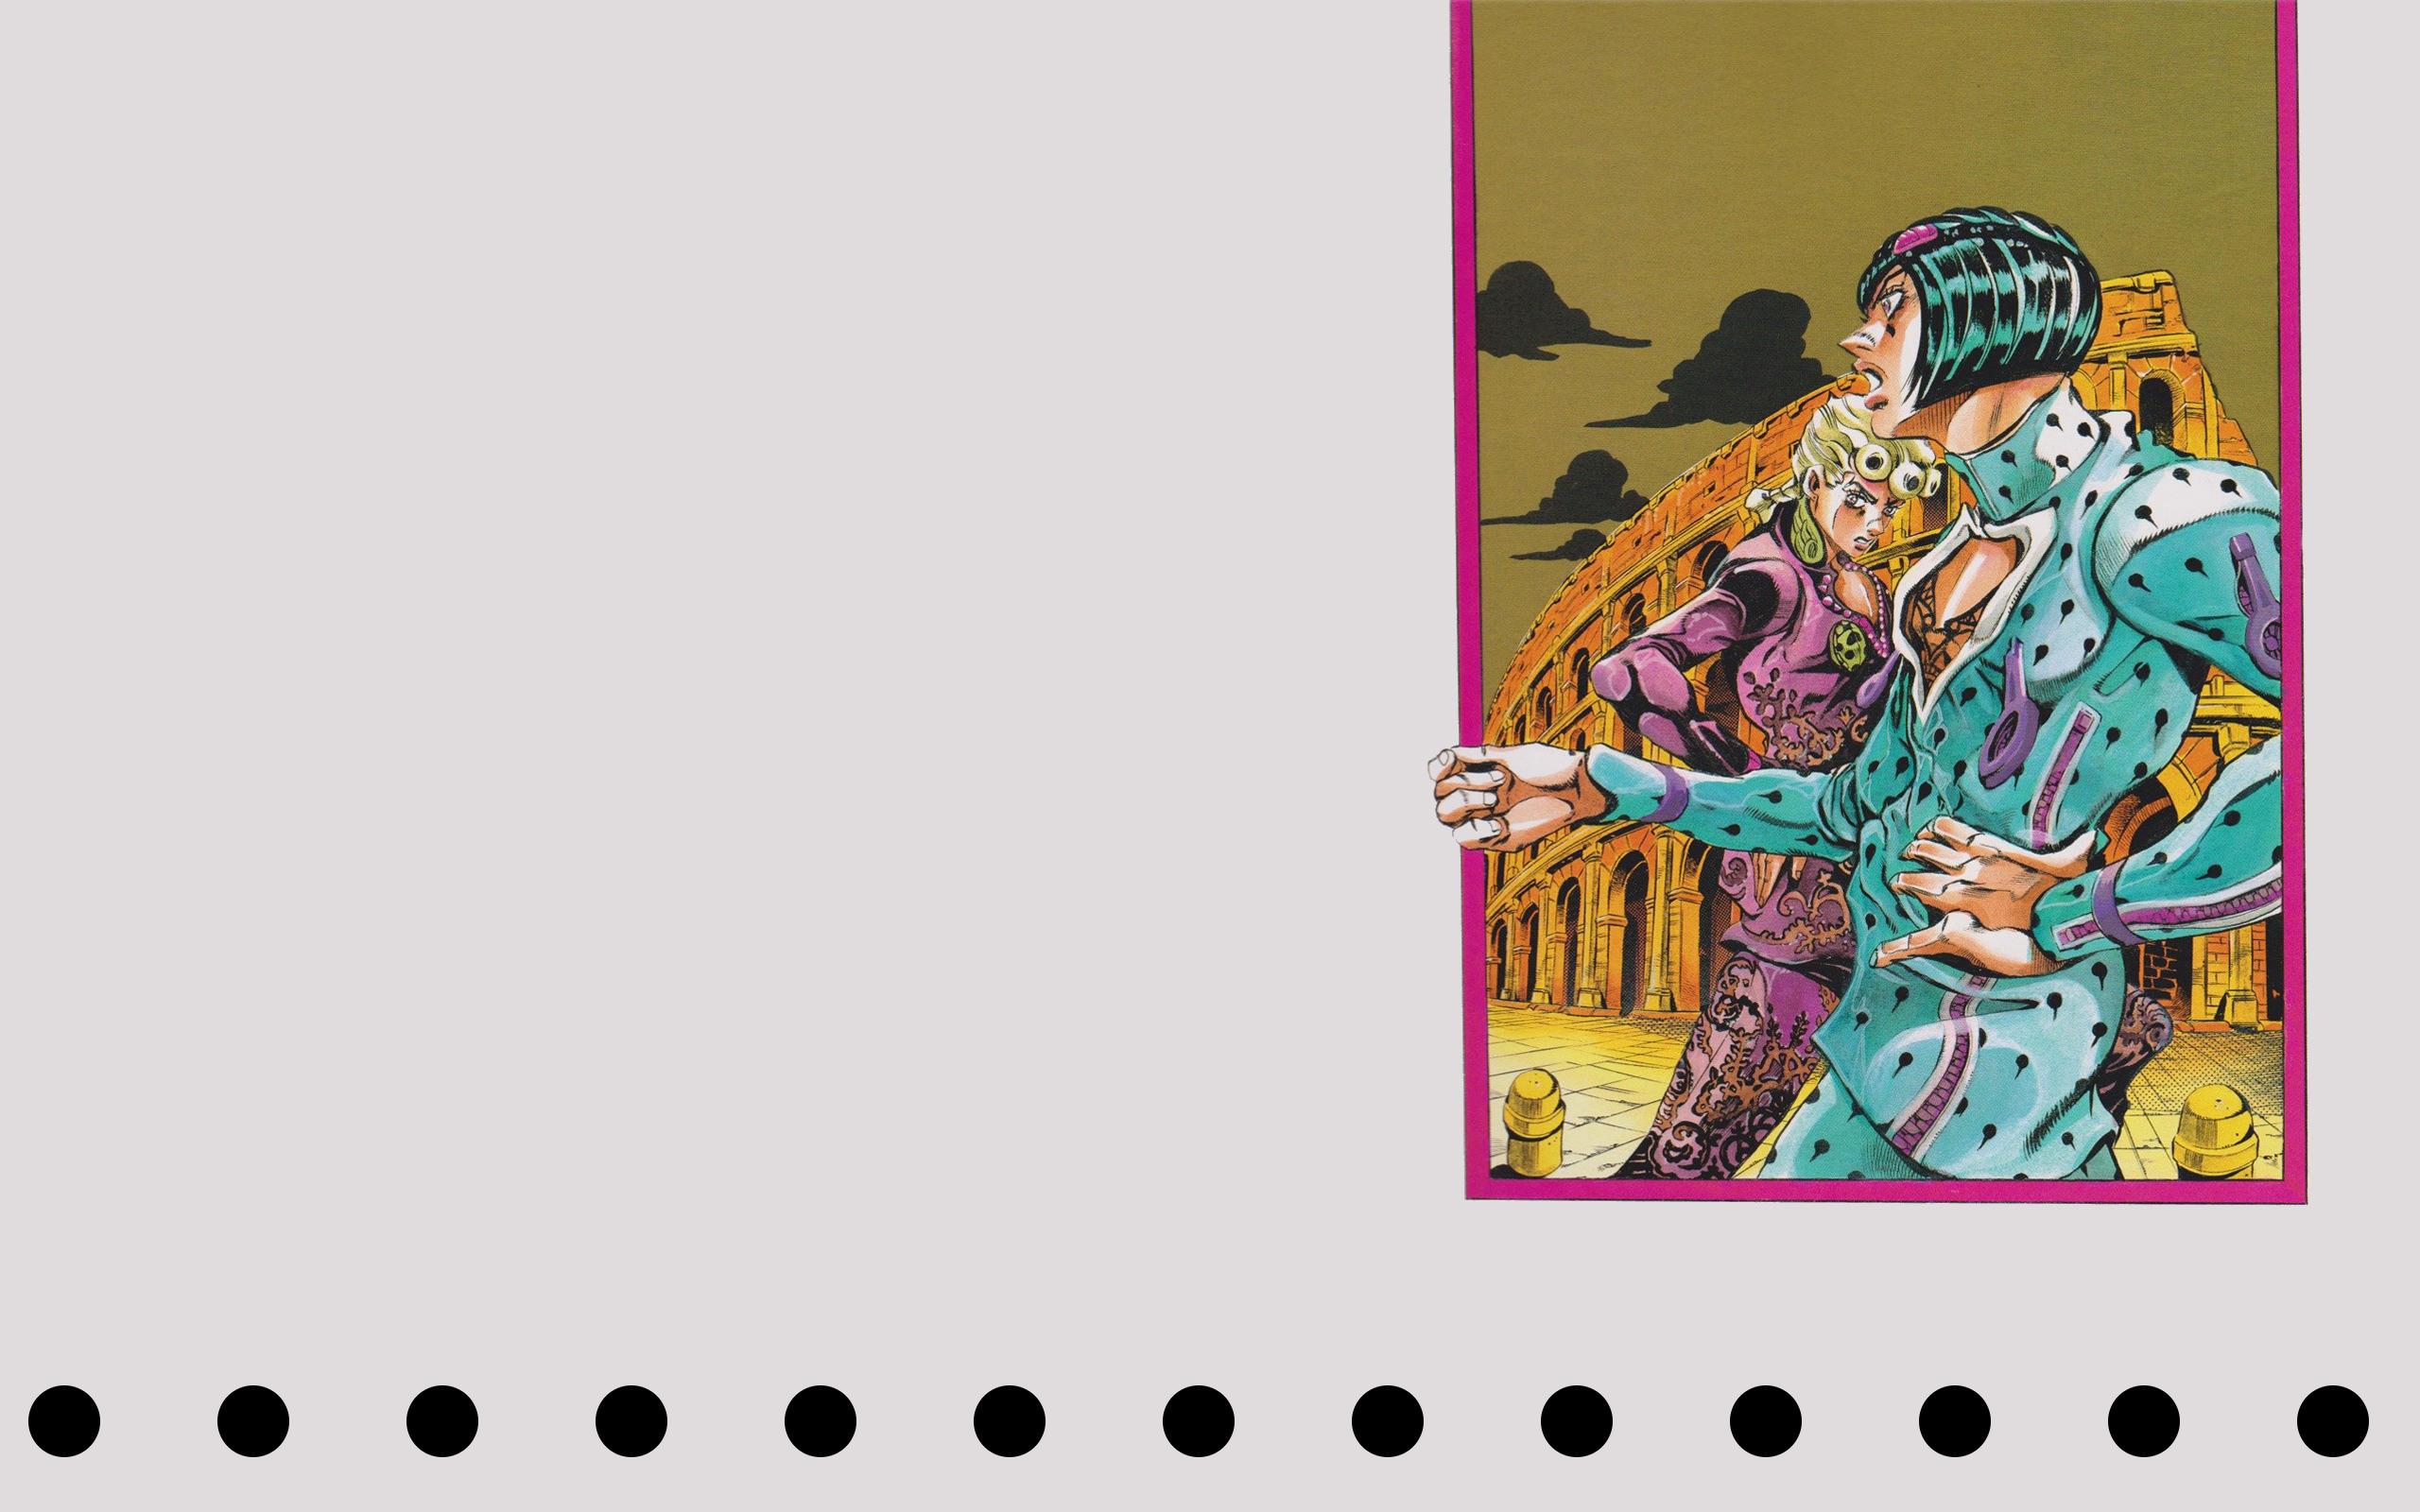 Wallpaper Jojo S Bizarre Adventure Anime Manga Hirohiko Araki